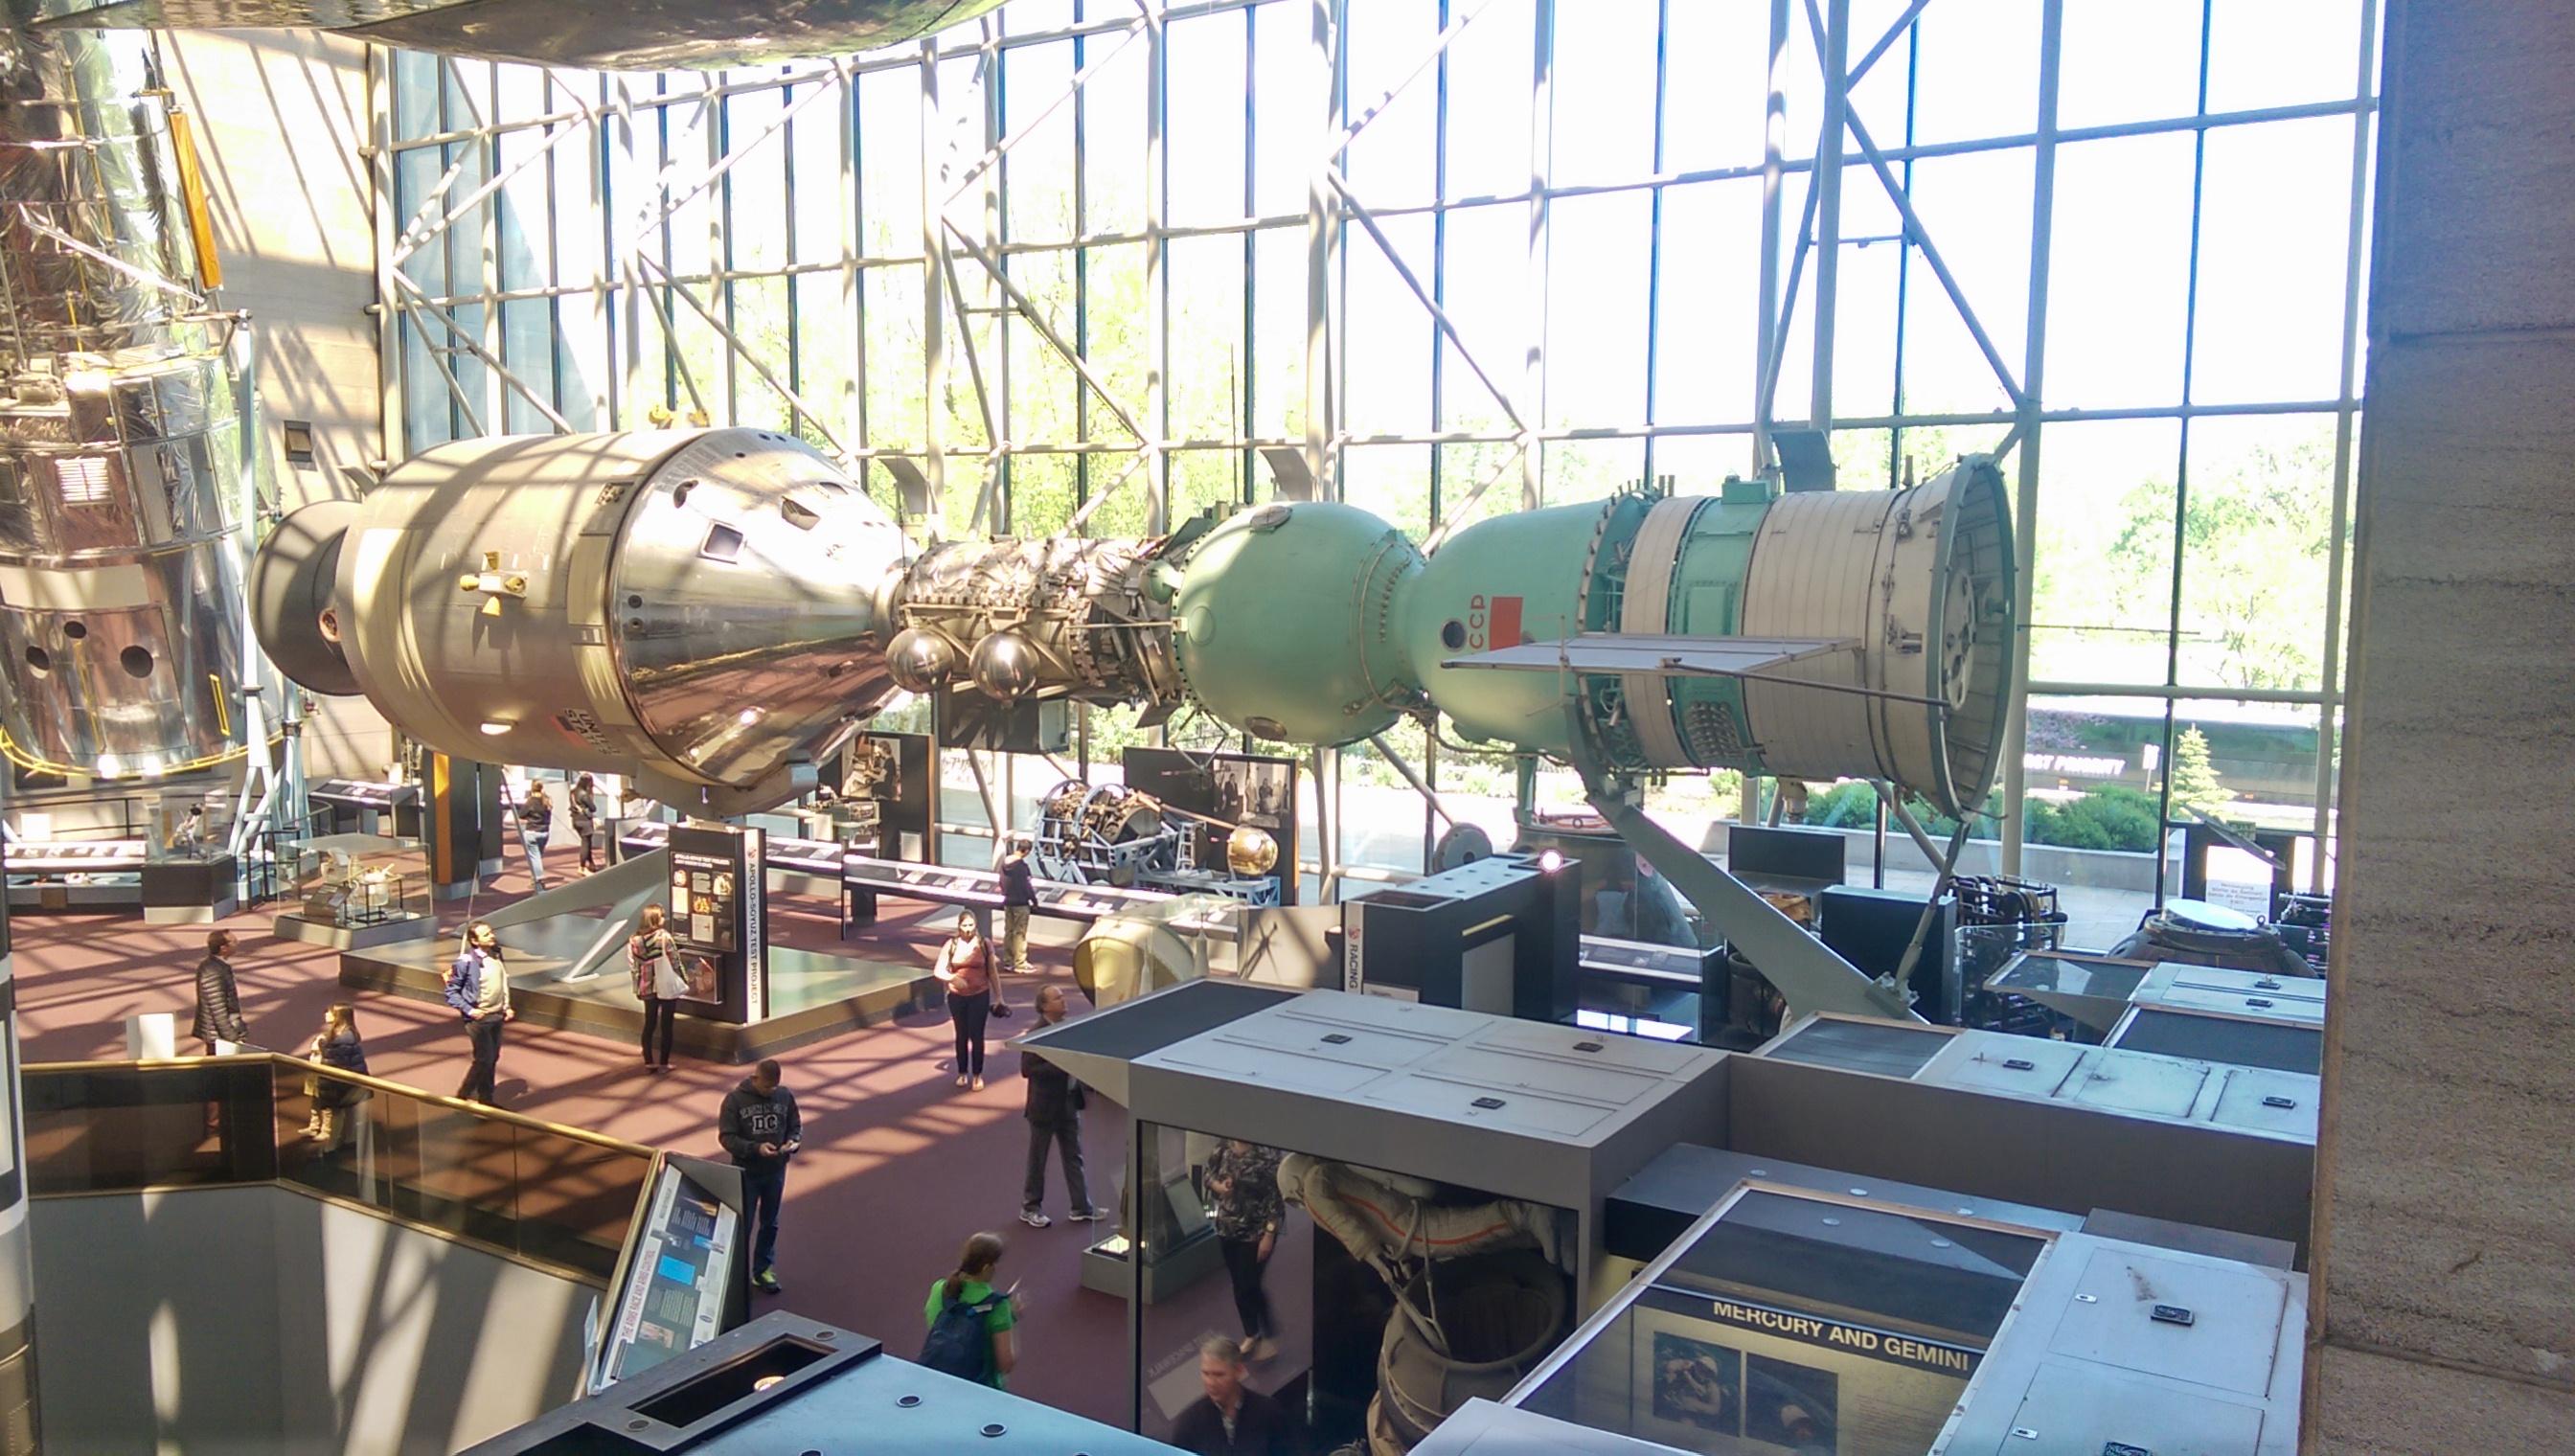 Apollo-Soyuz Test Project - (15-24.07.1975) 2015-04-26-Apollo-Soyuz-3